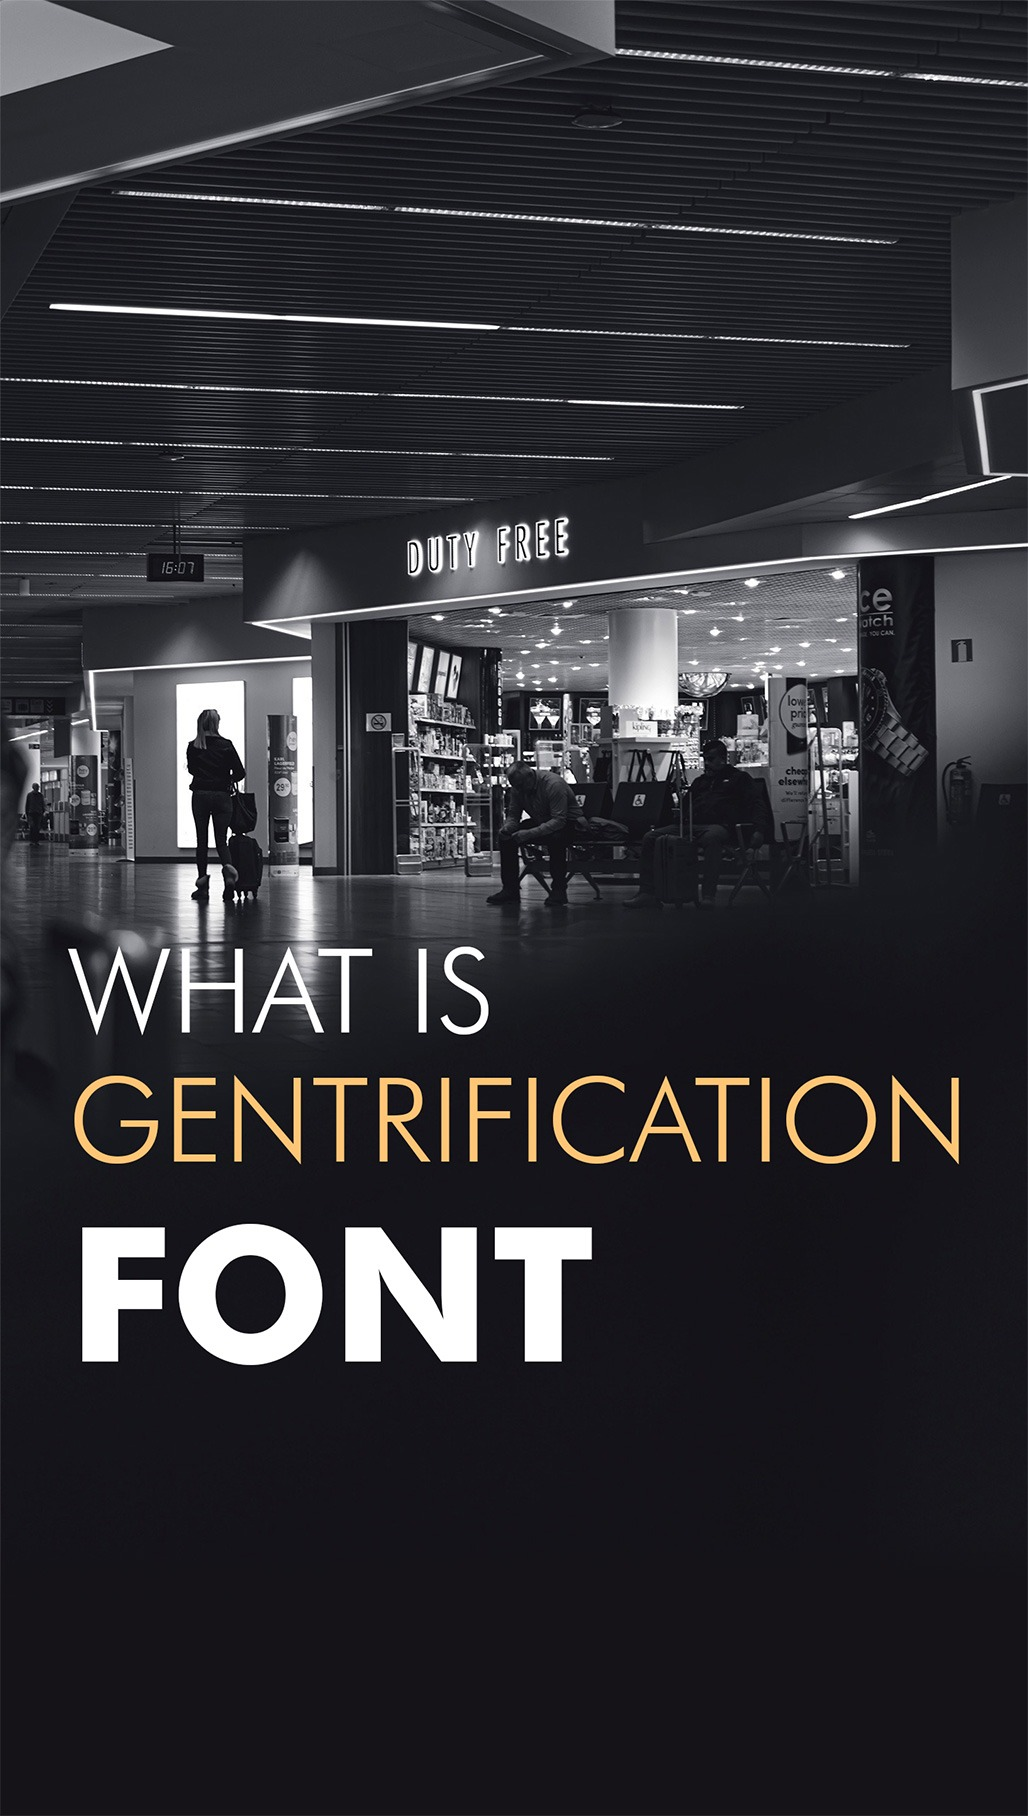 gratification font